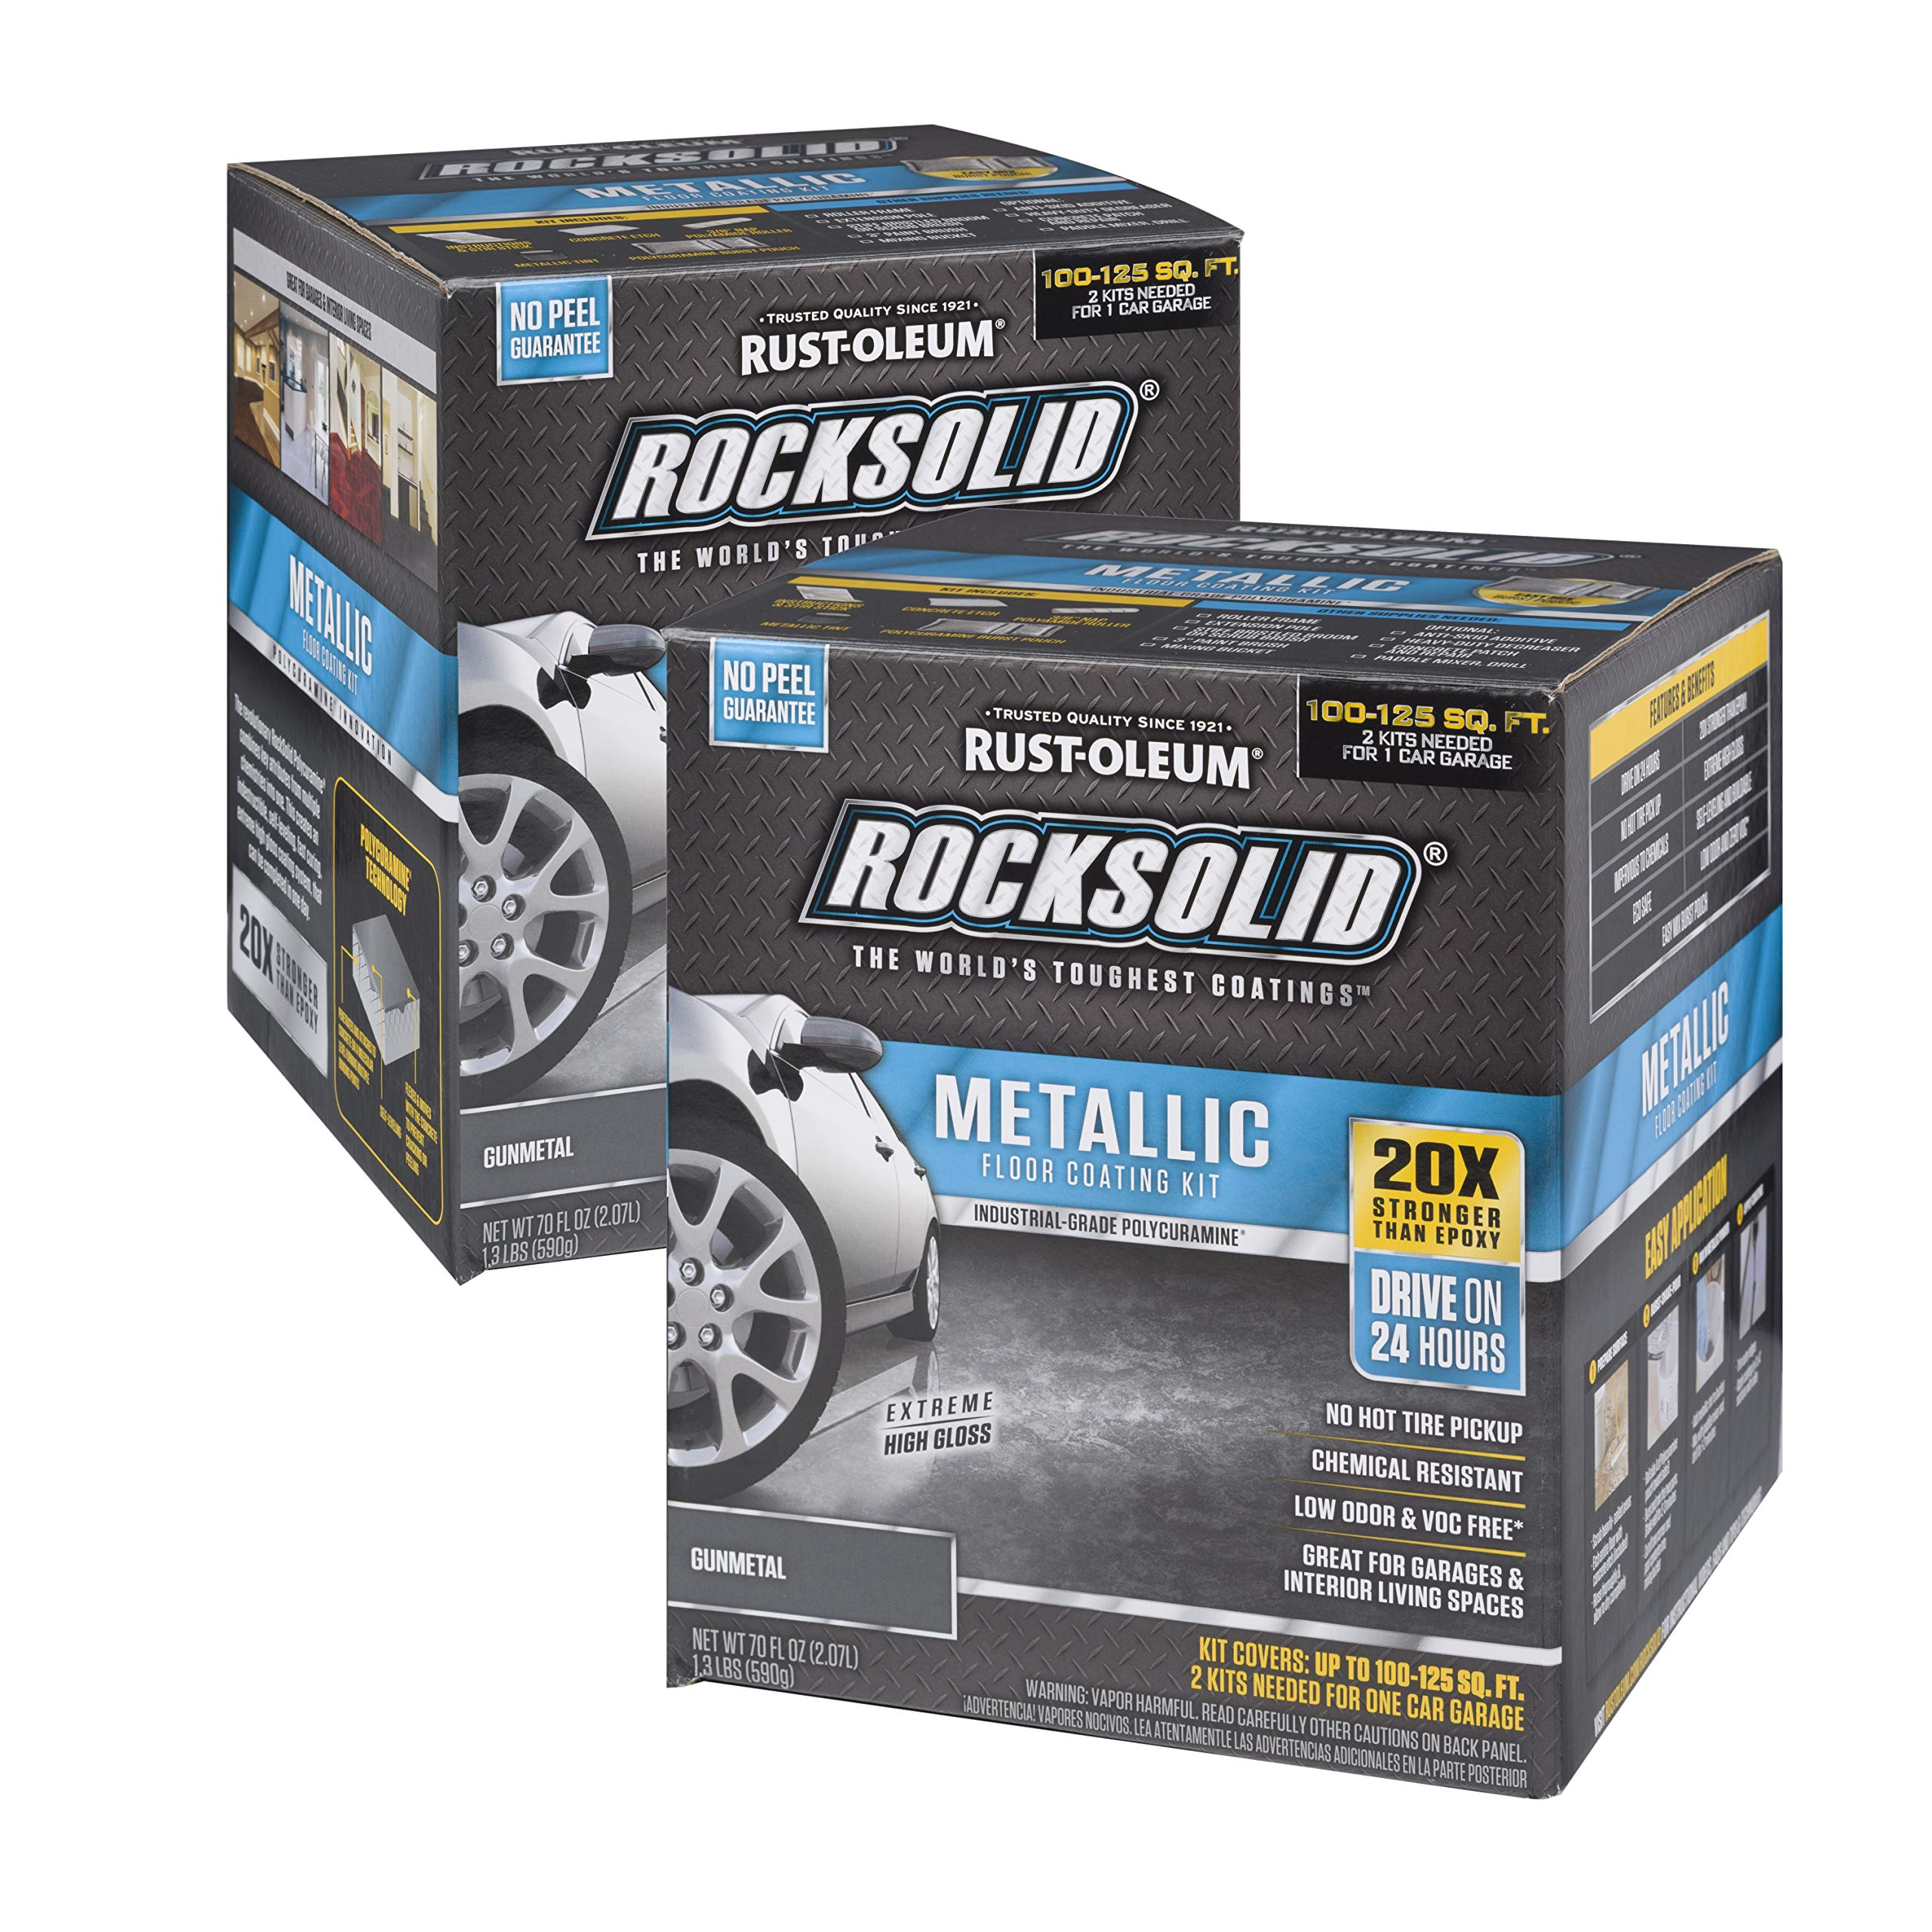 Rust-Oleum RockSolid Gunmetal Metallic Garage Floor Kit - 2 Pack